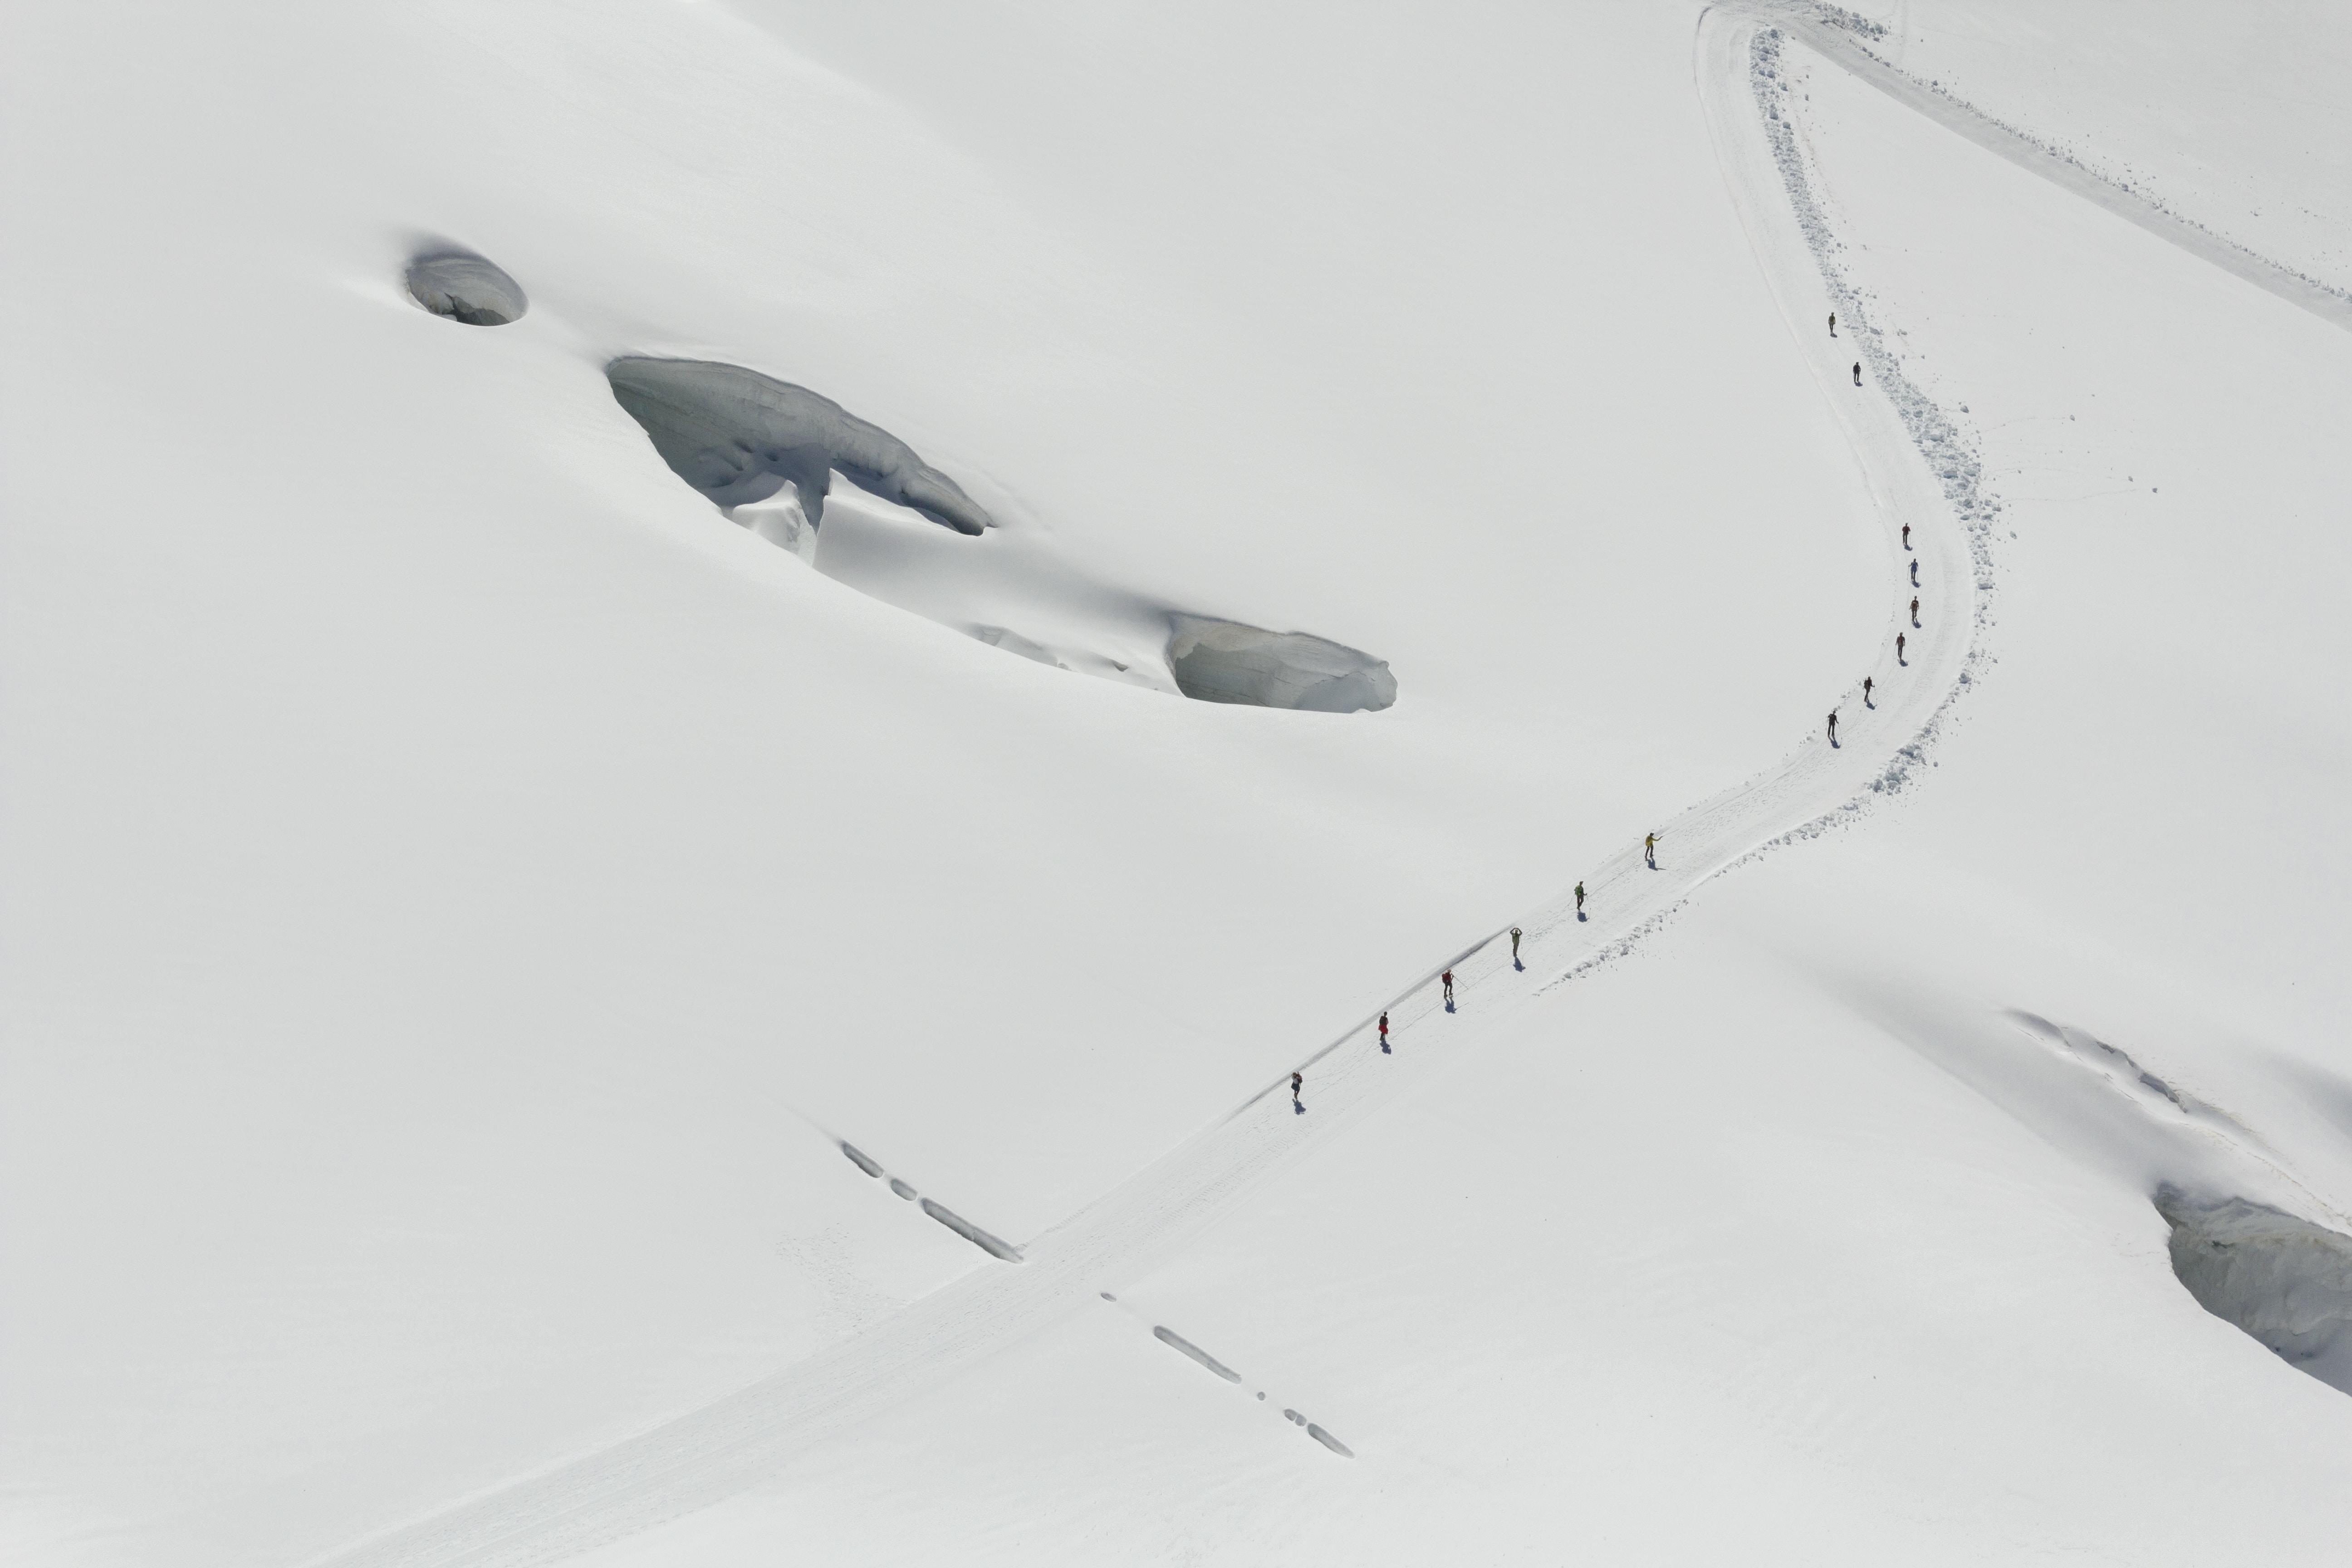 group of people walking on snow